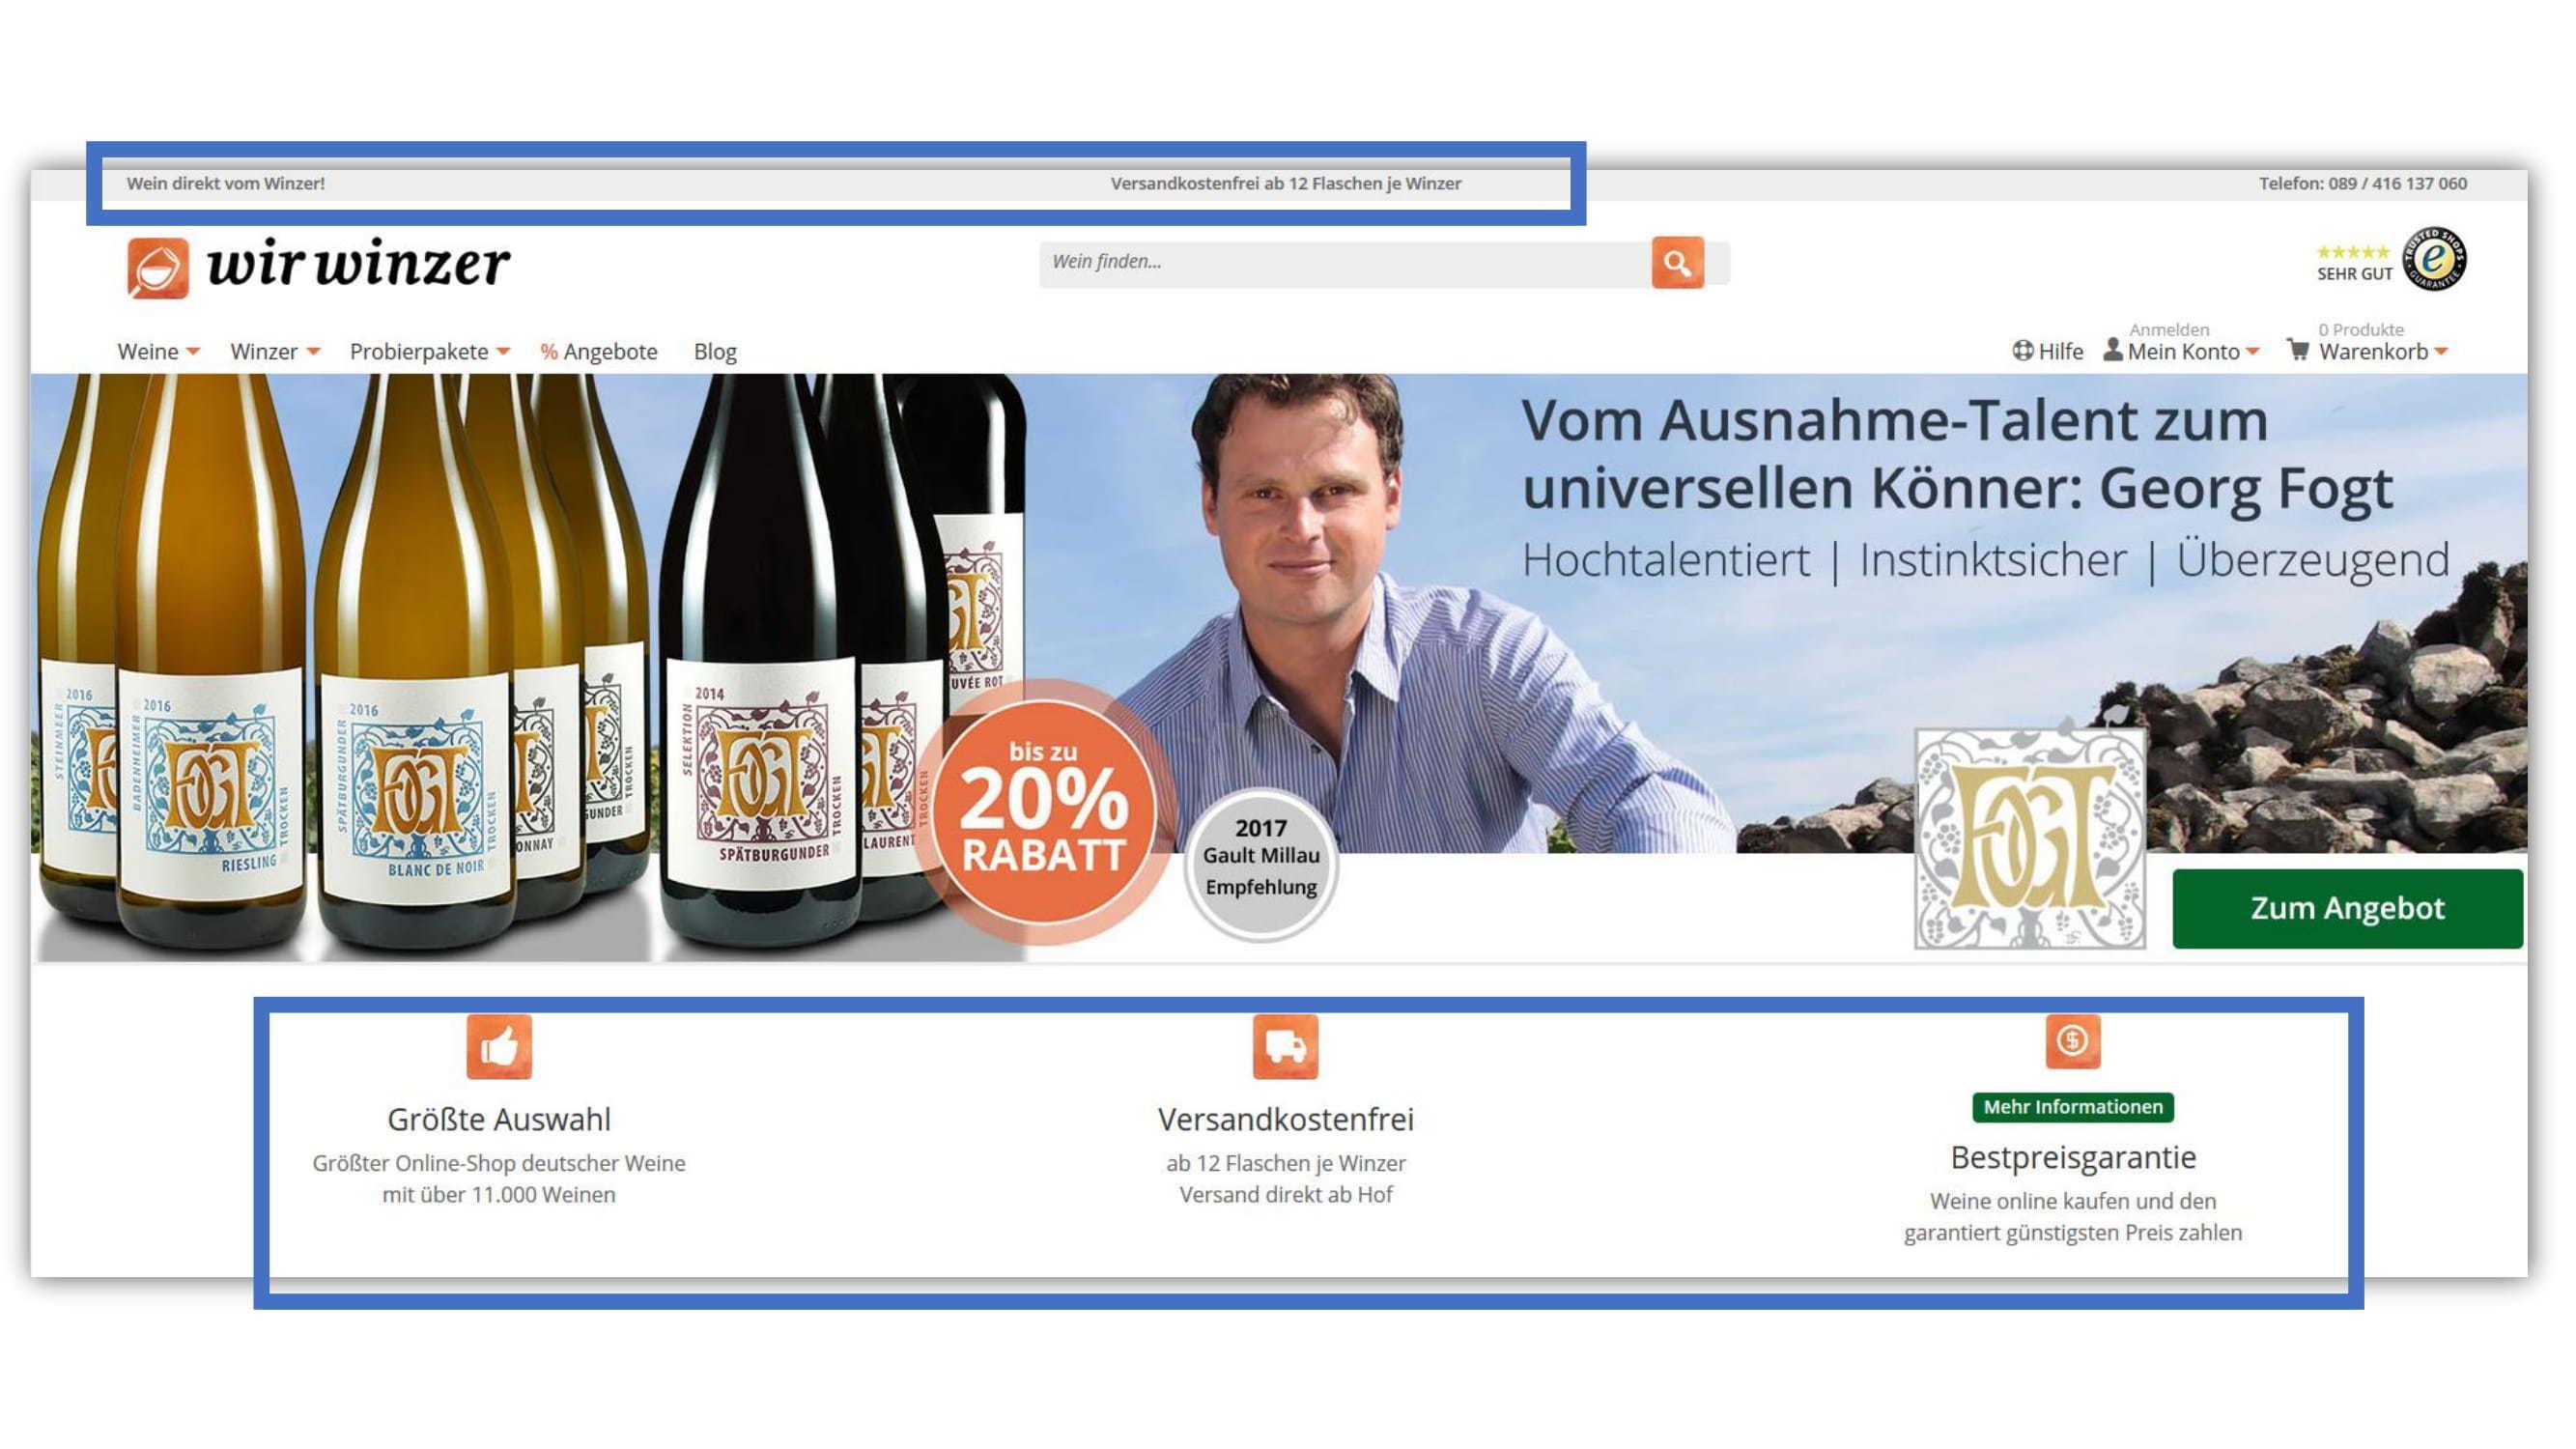 7-wirkungsvolle-online-marketing-hebel-fur-online-shops-58.jpg